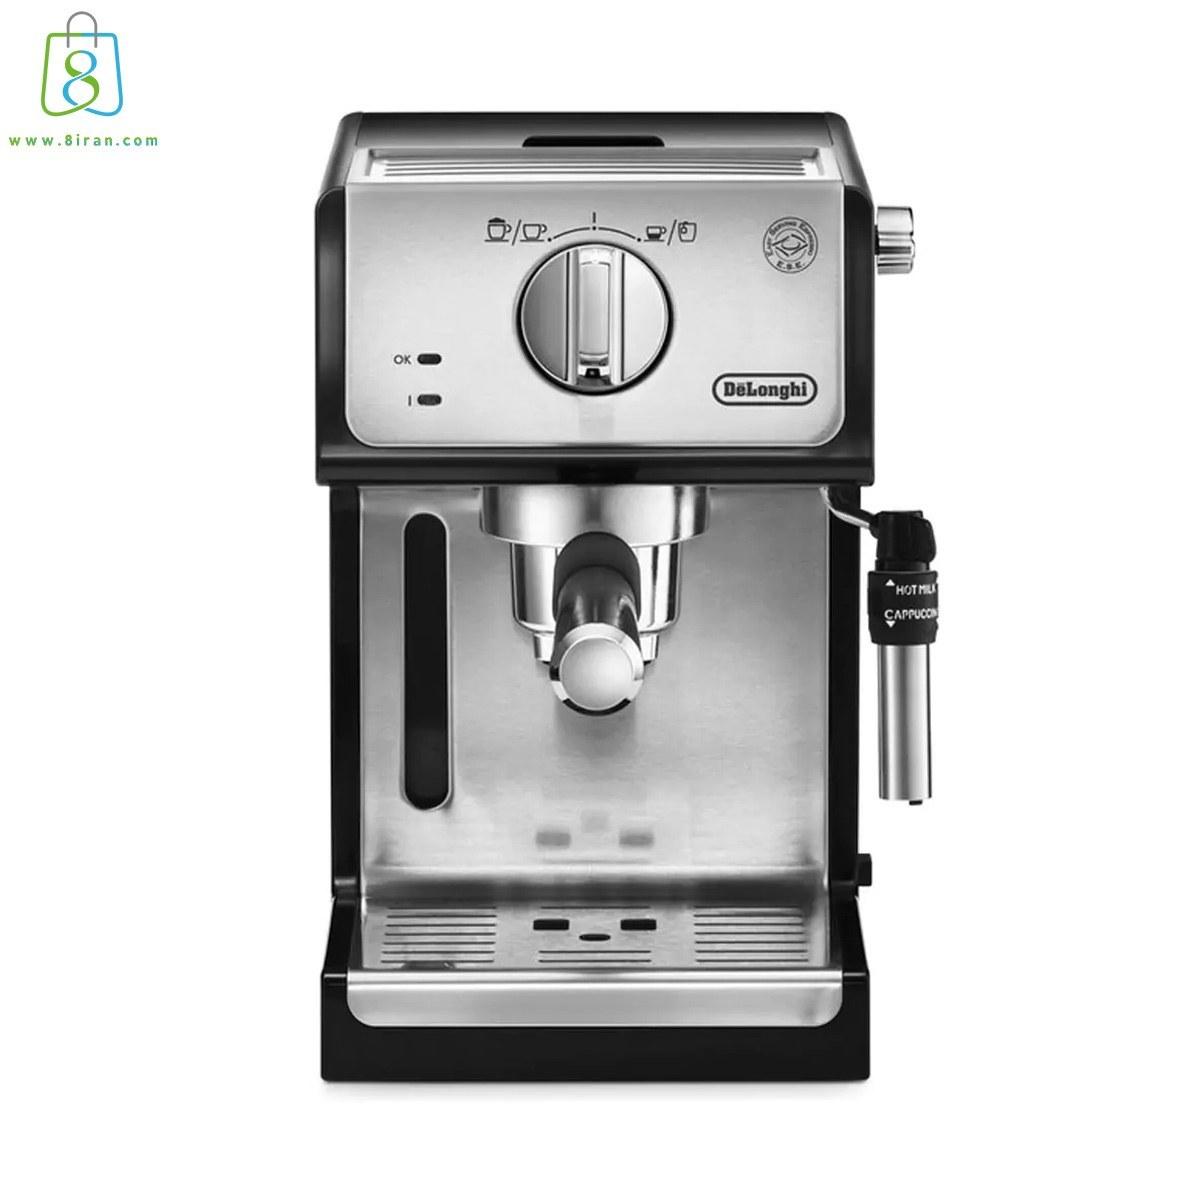 تصویر اسپرسوساز دلونگی مدل ECP35.31 Delonghi ECP35.31 Espresso Maker